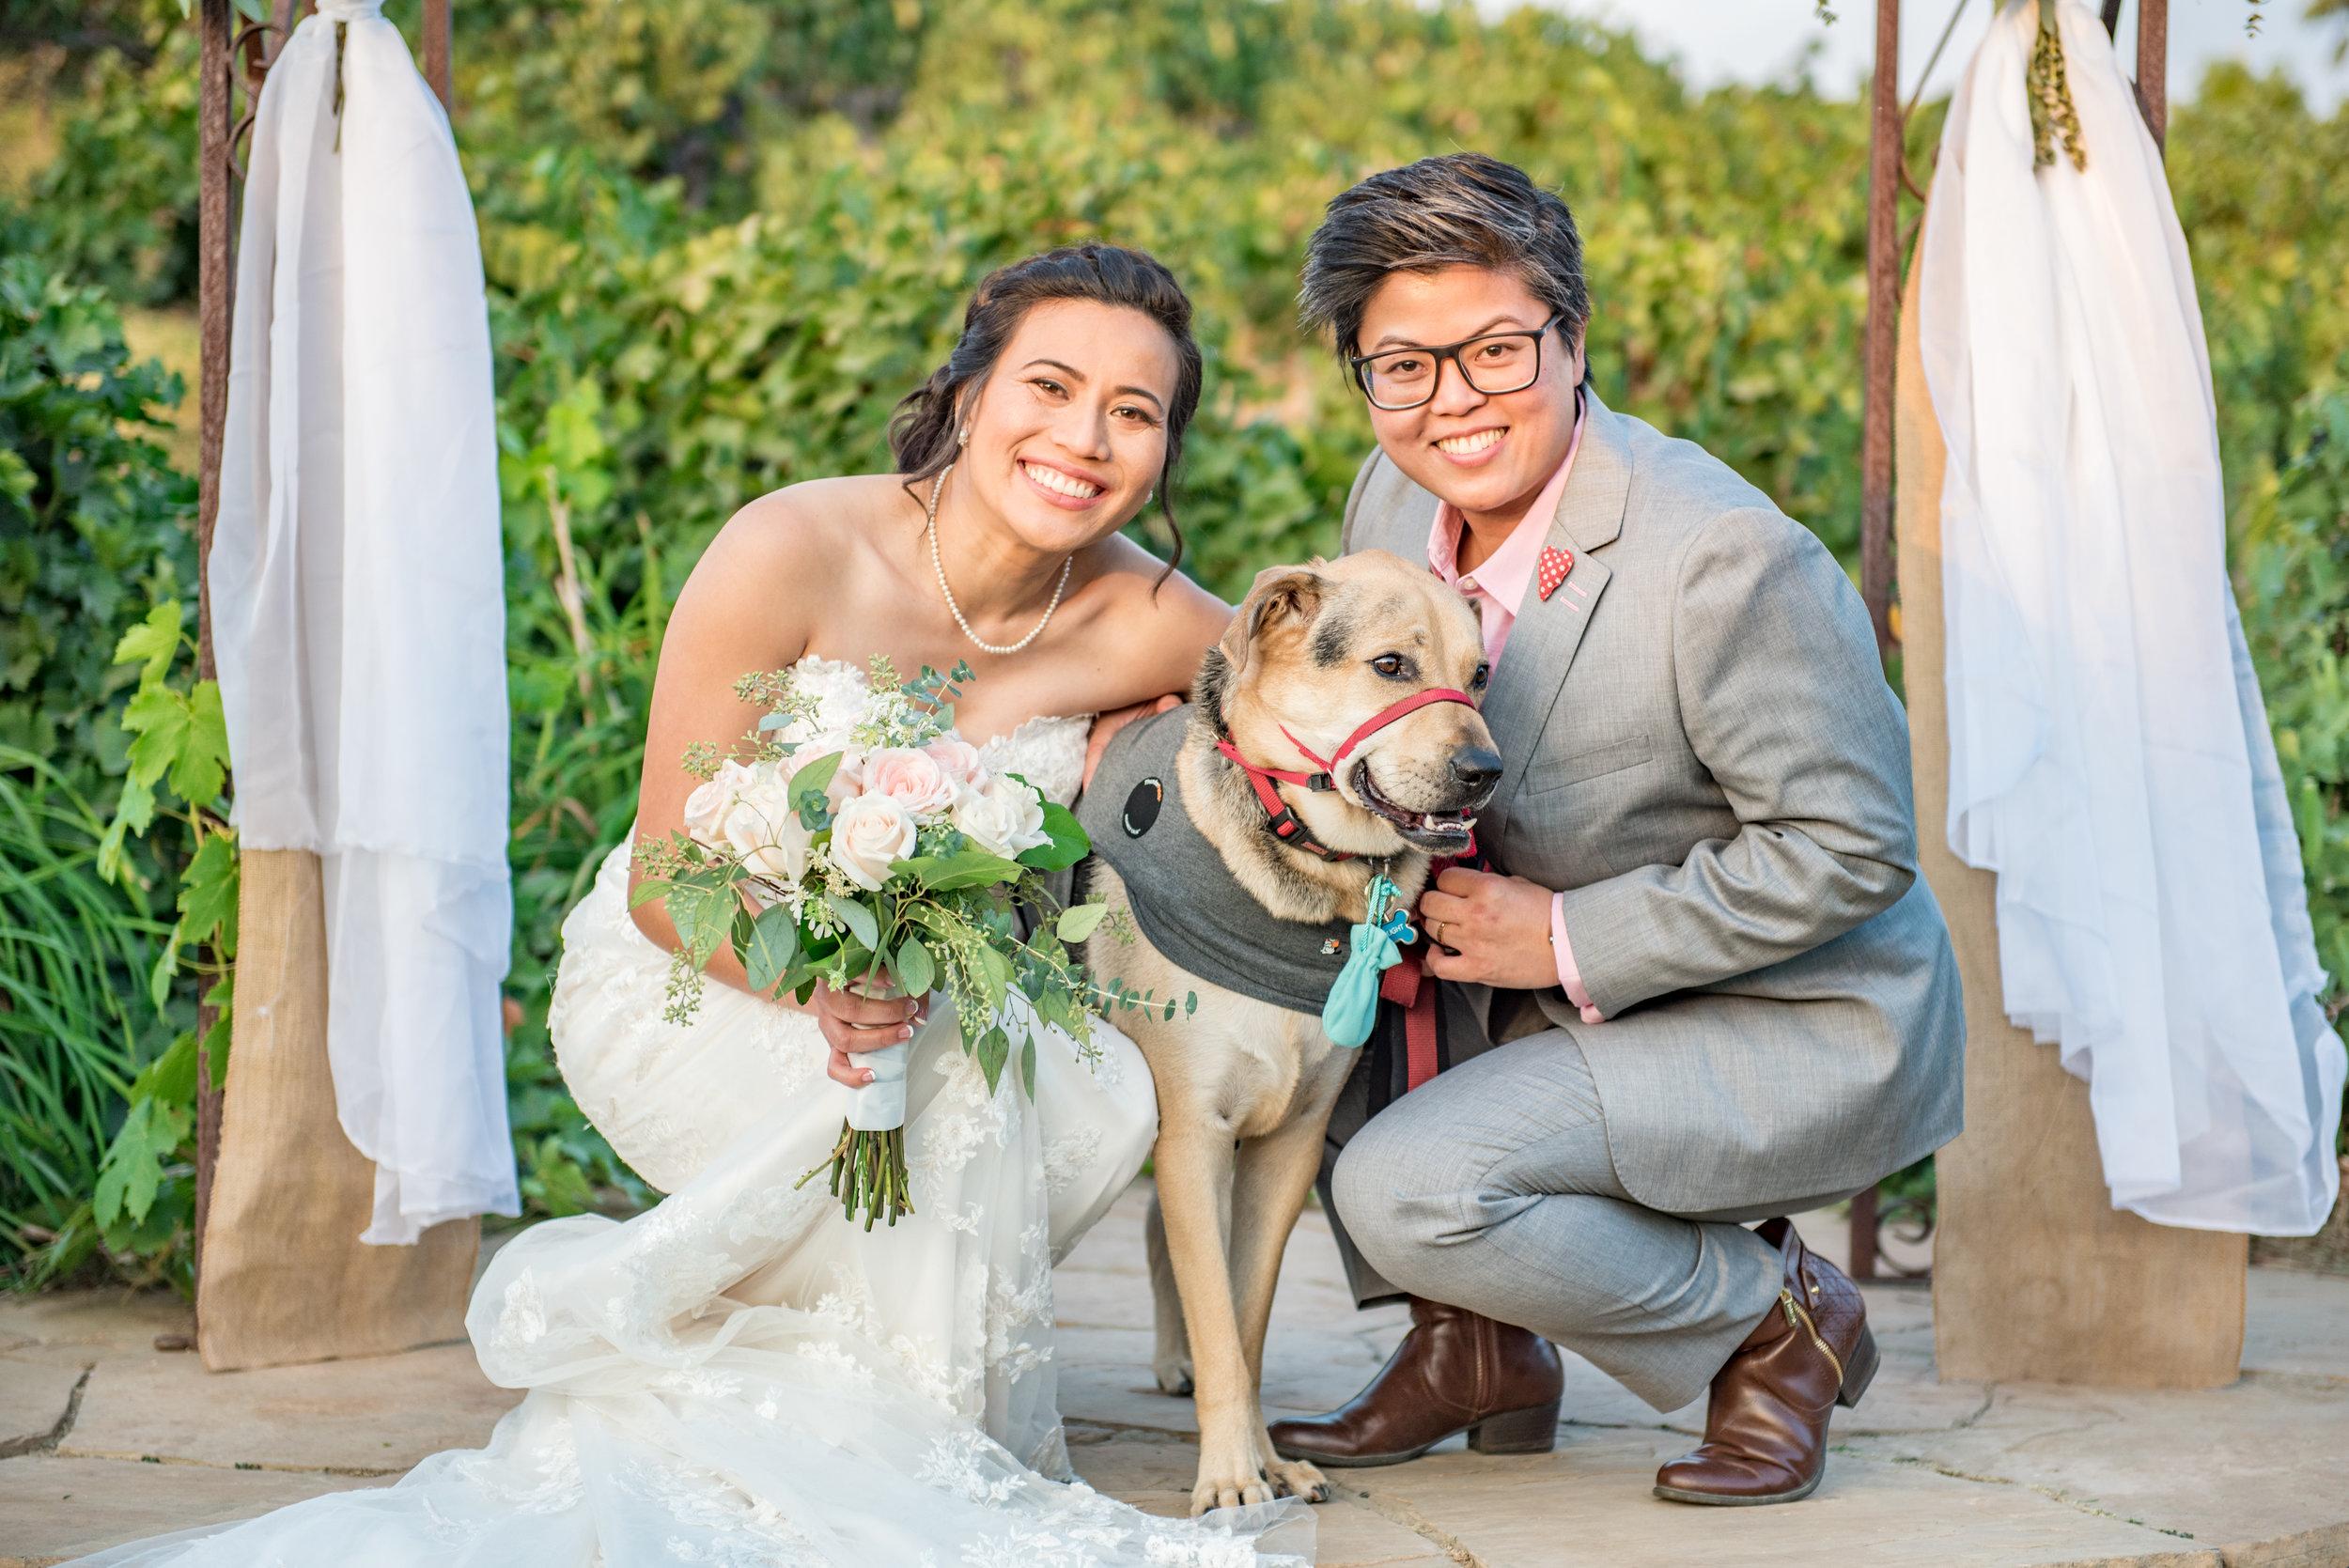 Marlou & Cary- Temecula, CA Winery Wedding